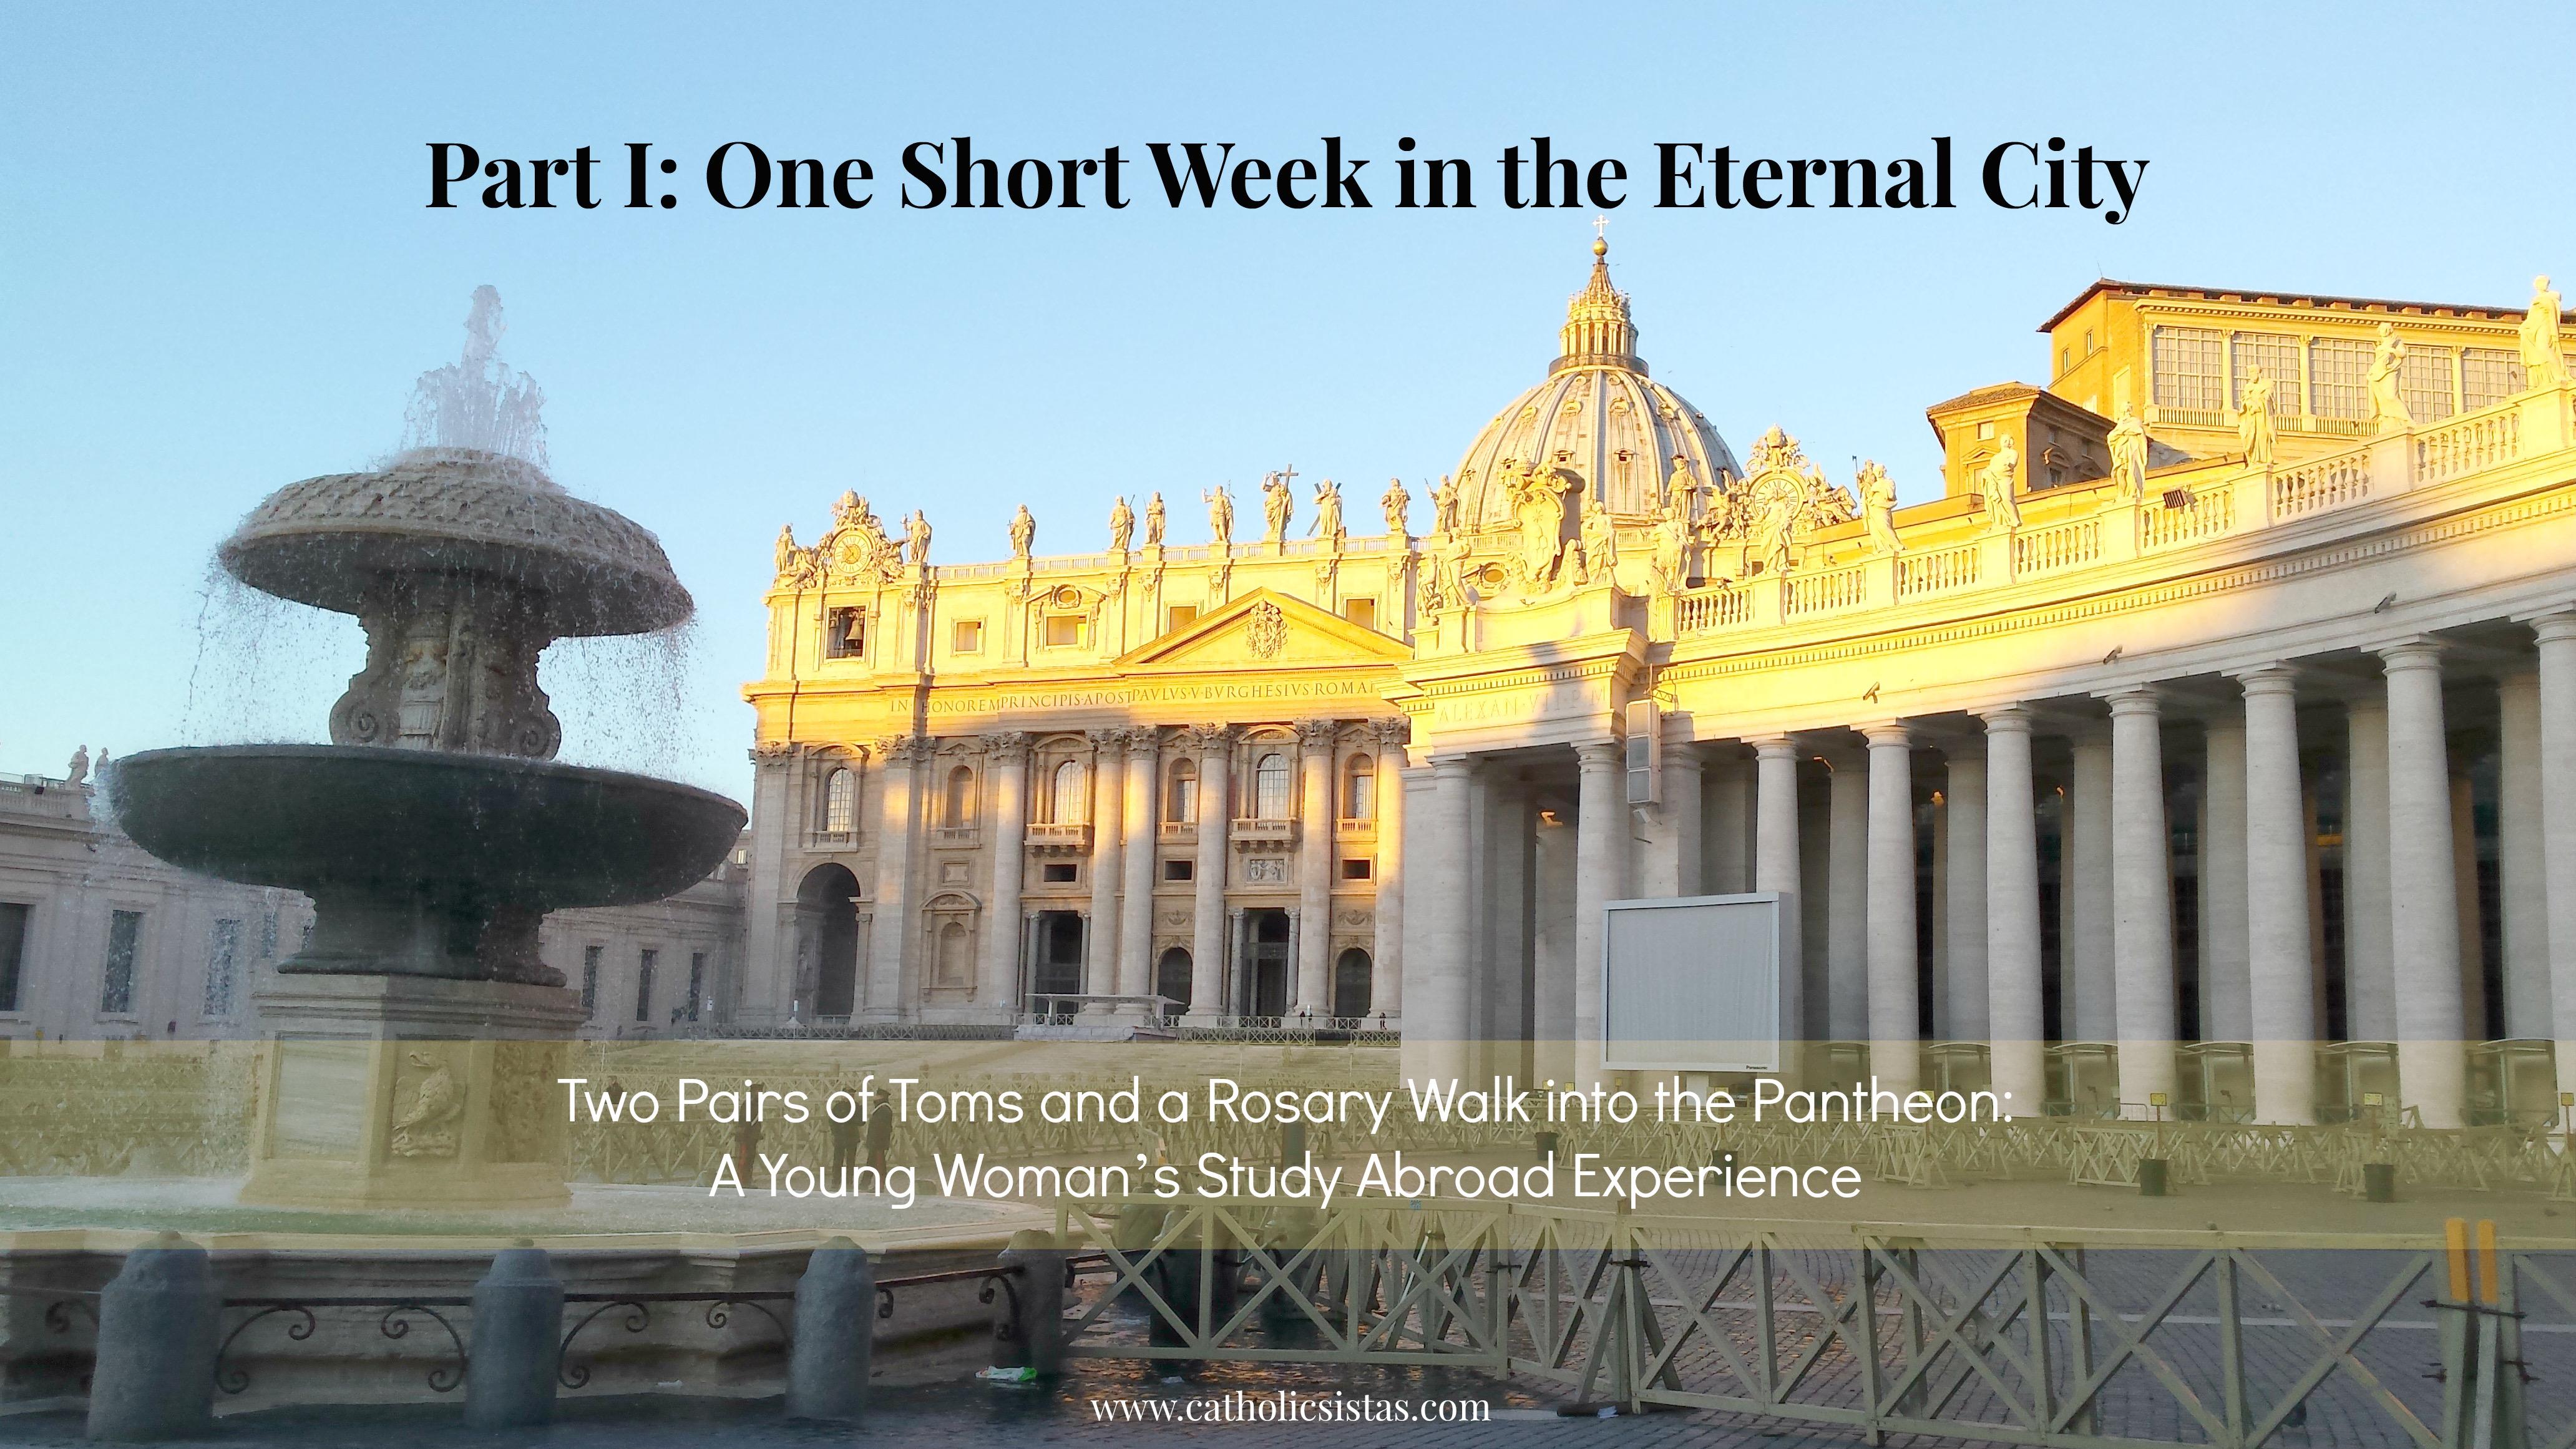 Series Photo, Rome, Eternal City, St. Peter Basilica